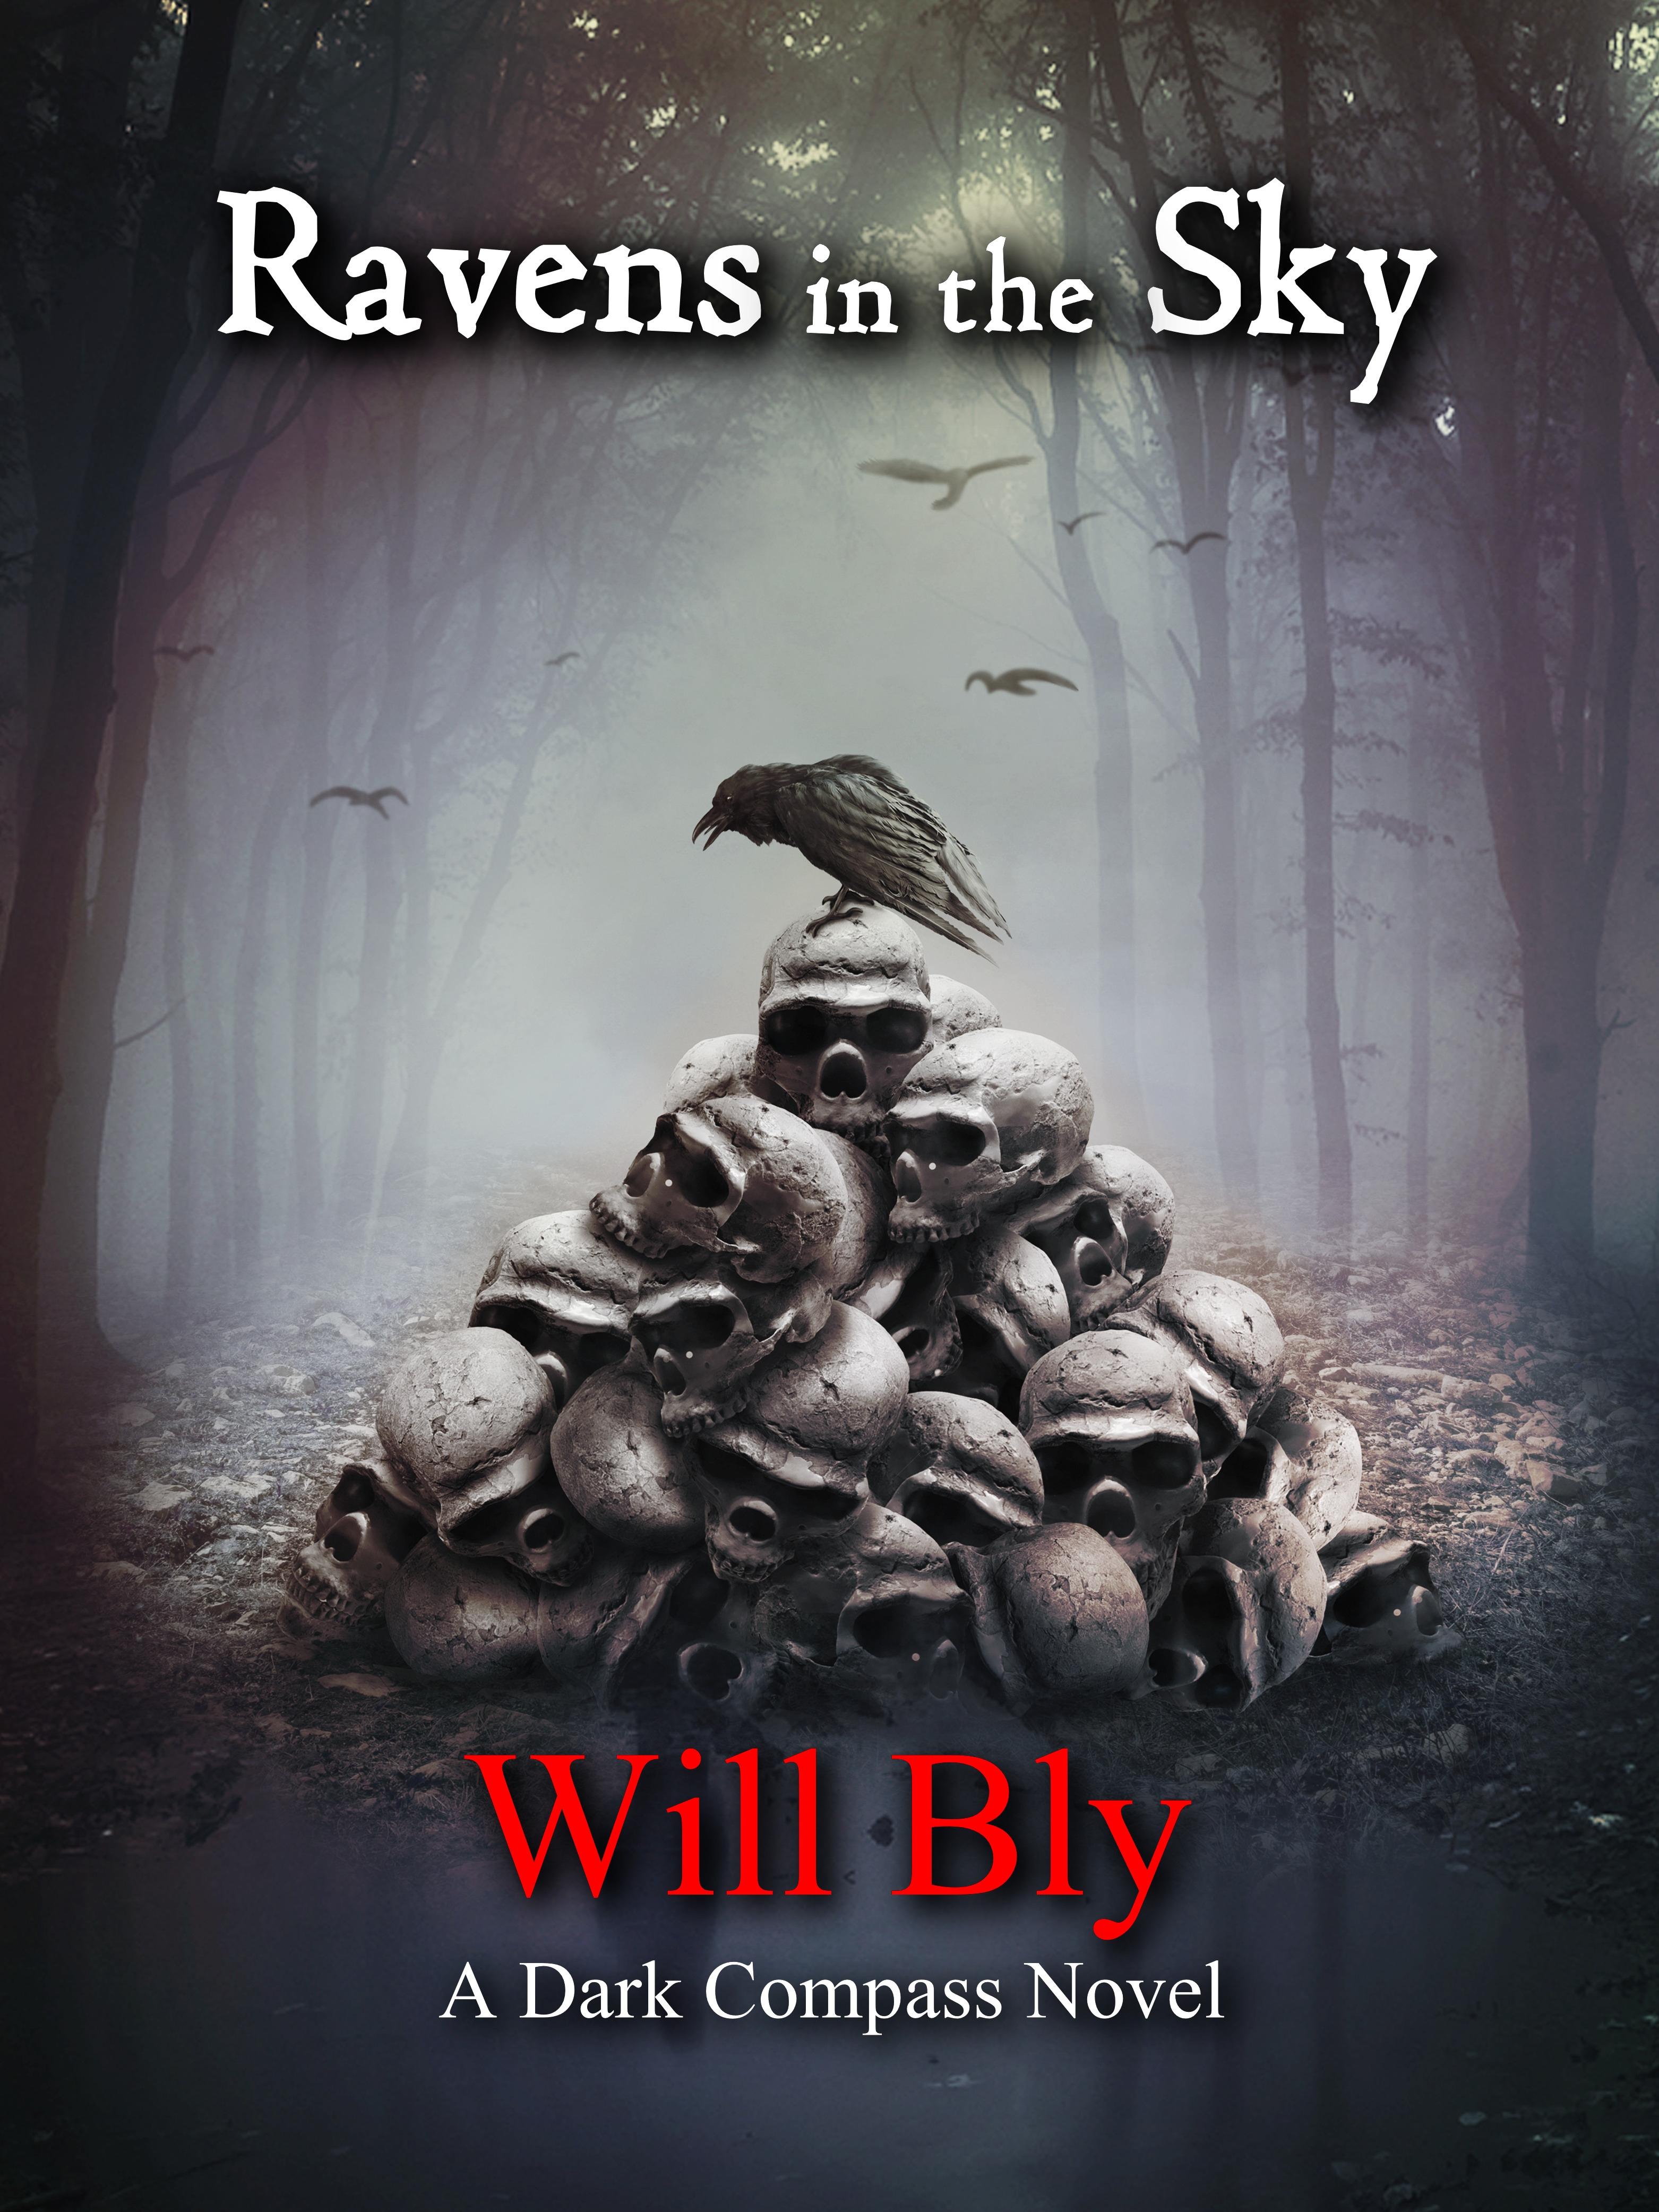 Ravens in the Sky: A Dark Compass Novel